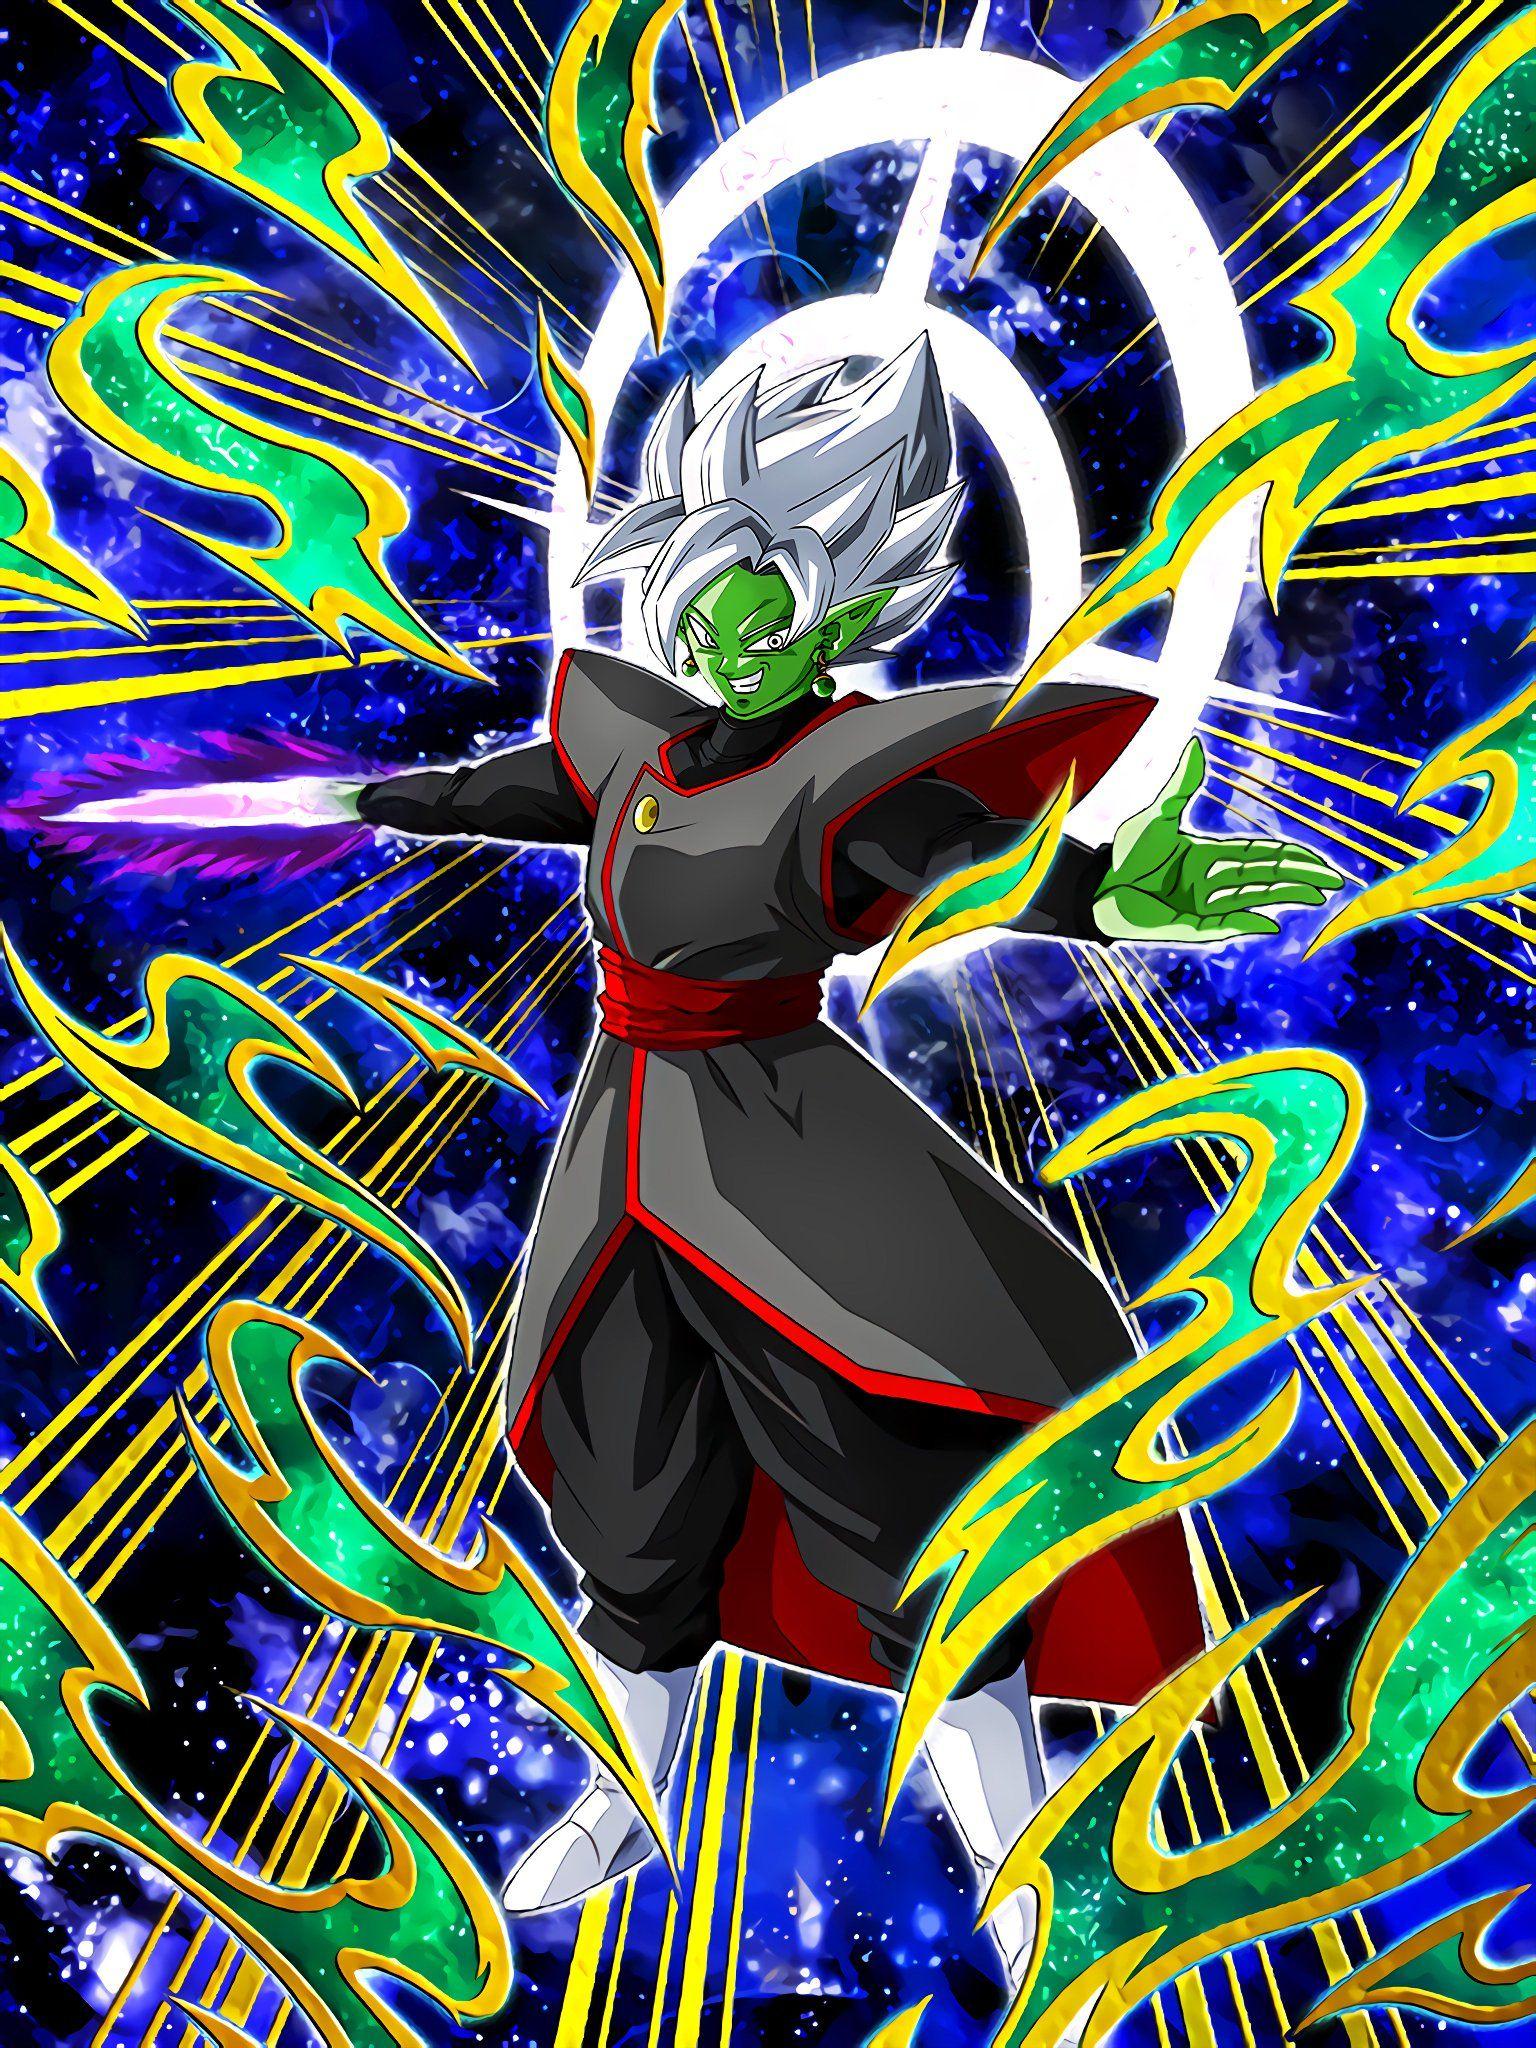 Hydros On Twitter Dragon Ball Artwork Dragon Ball Art Anime Dragon Ball Super